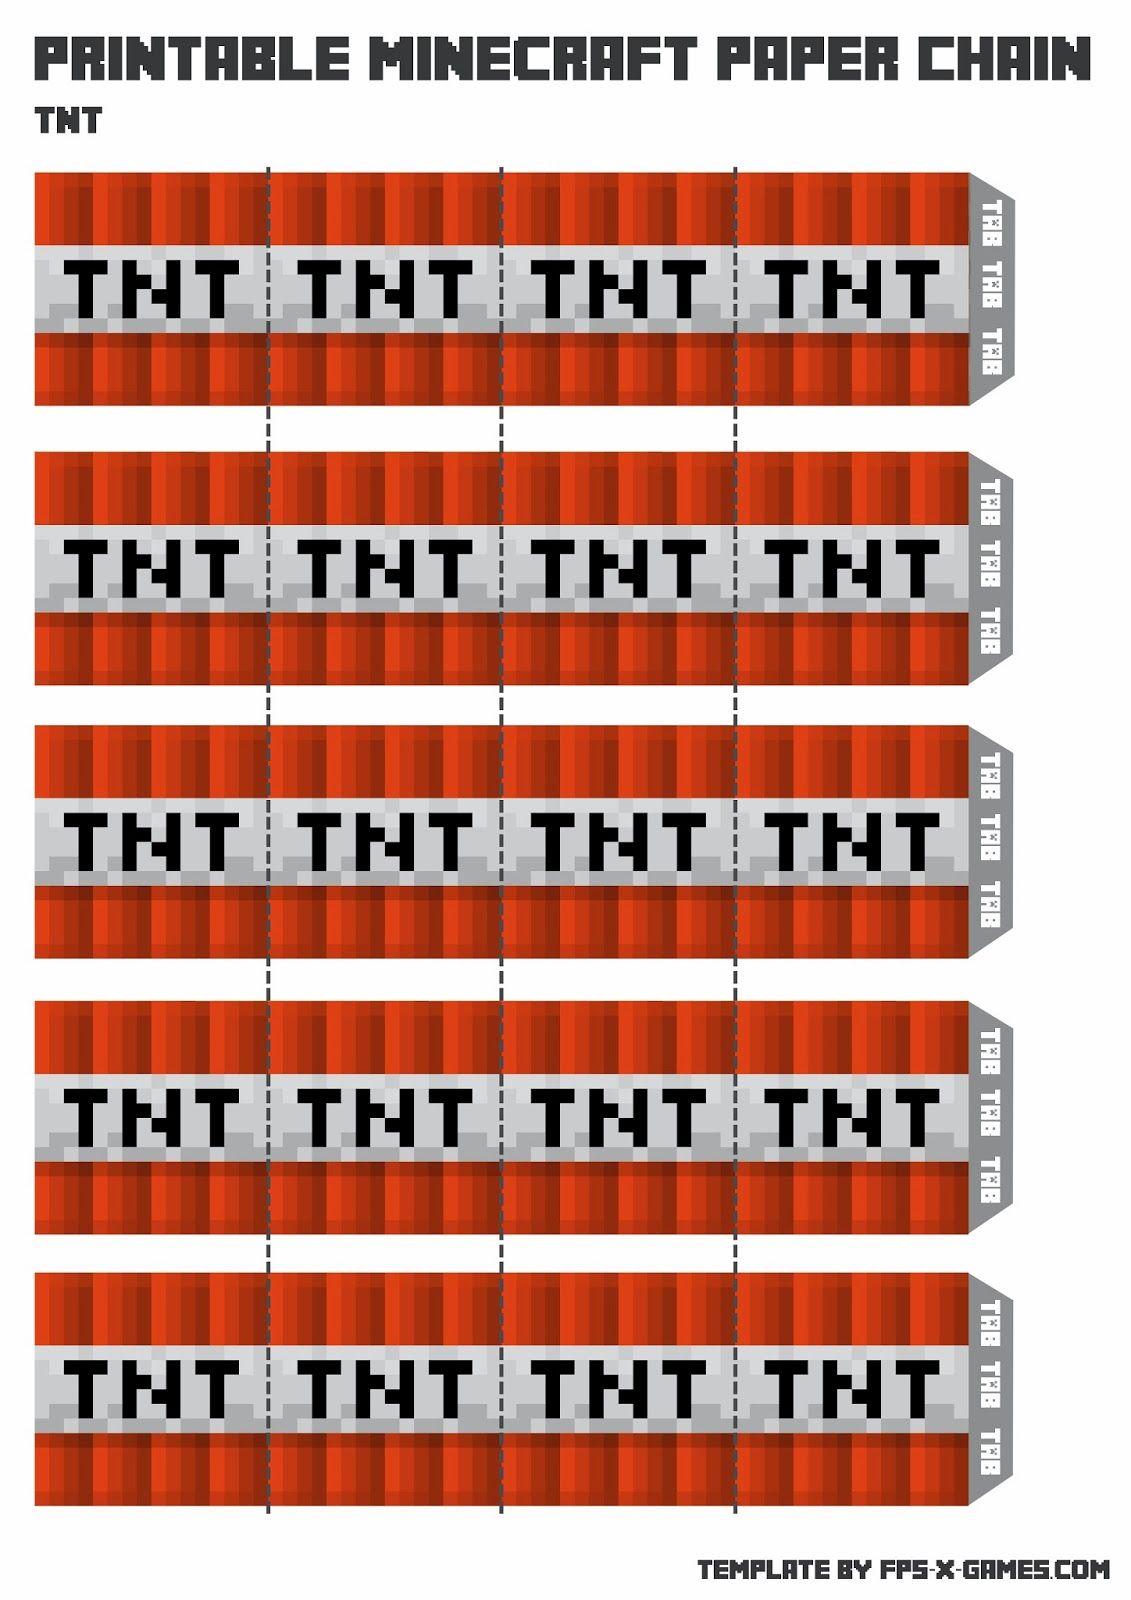 Free Printable Minecraft Templates Tnt Minecraft Party Printables Minecraft Party Minecraft Printables